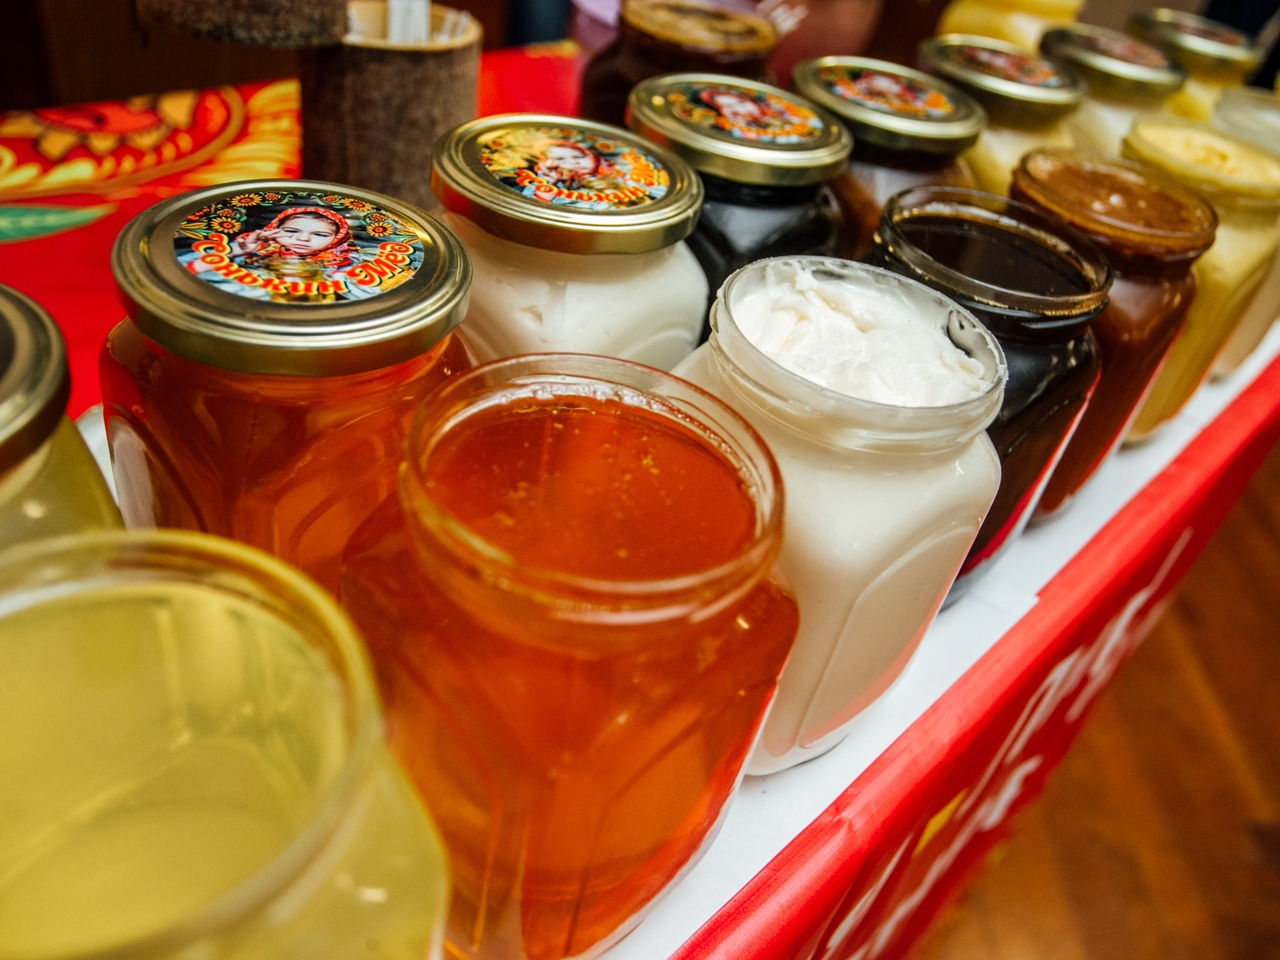 Роман Старовойт: нужно развивать бренд «Курский мёд»